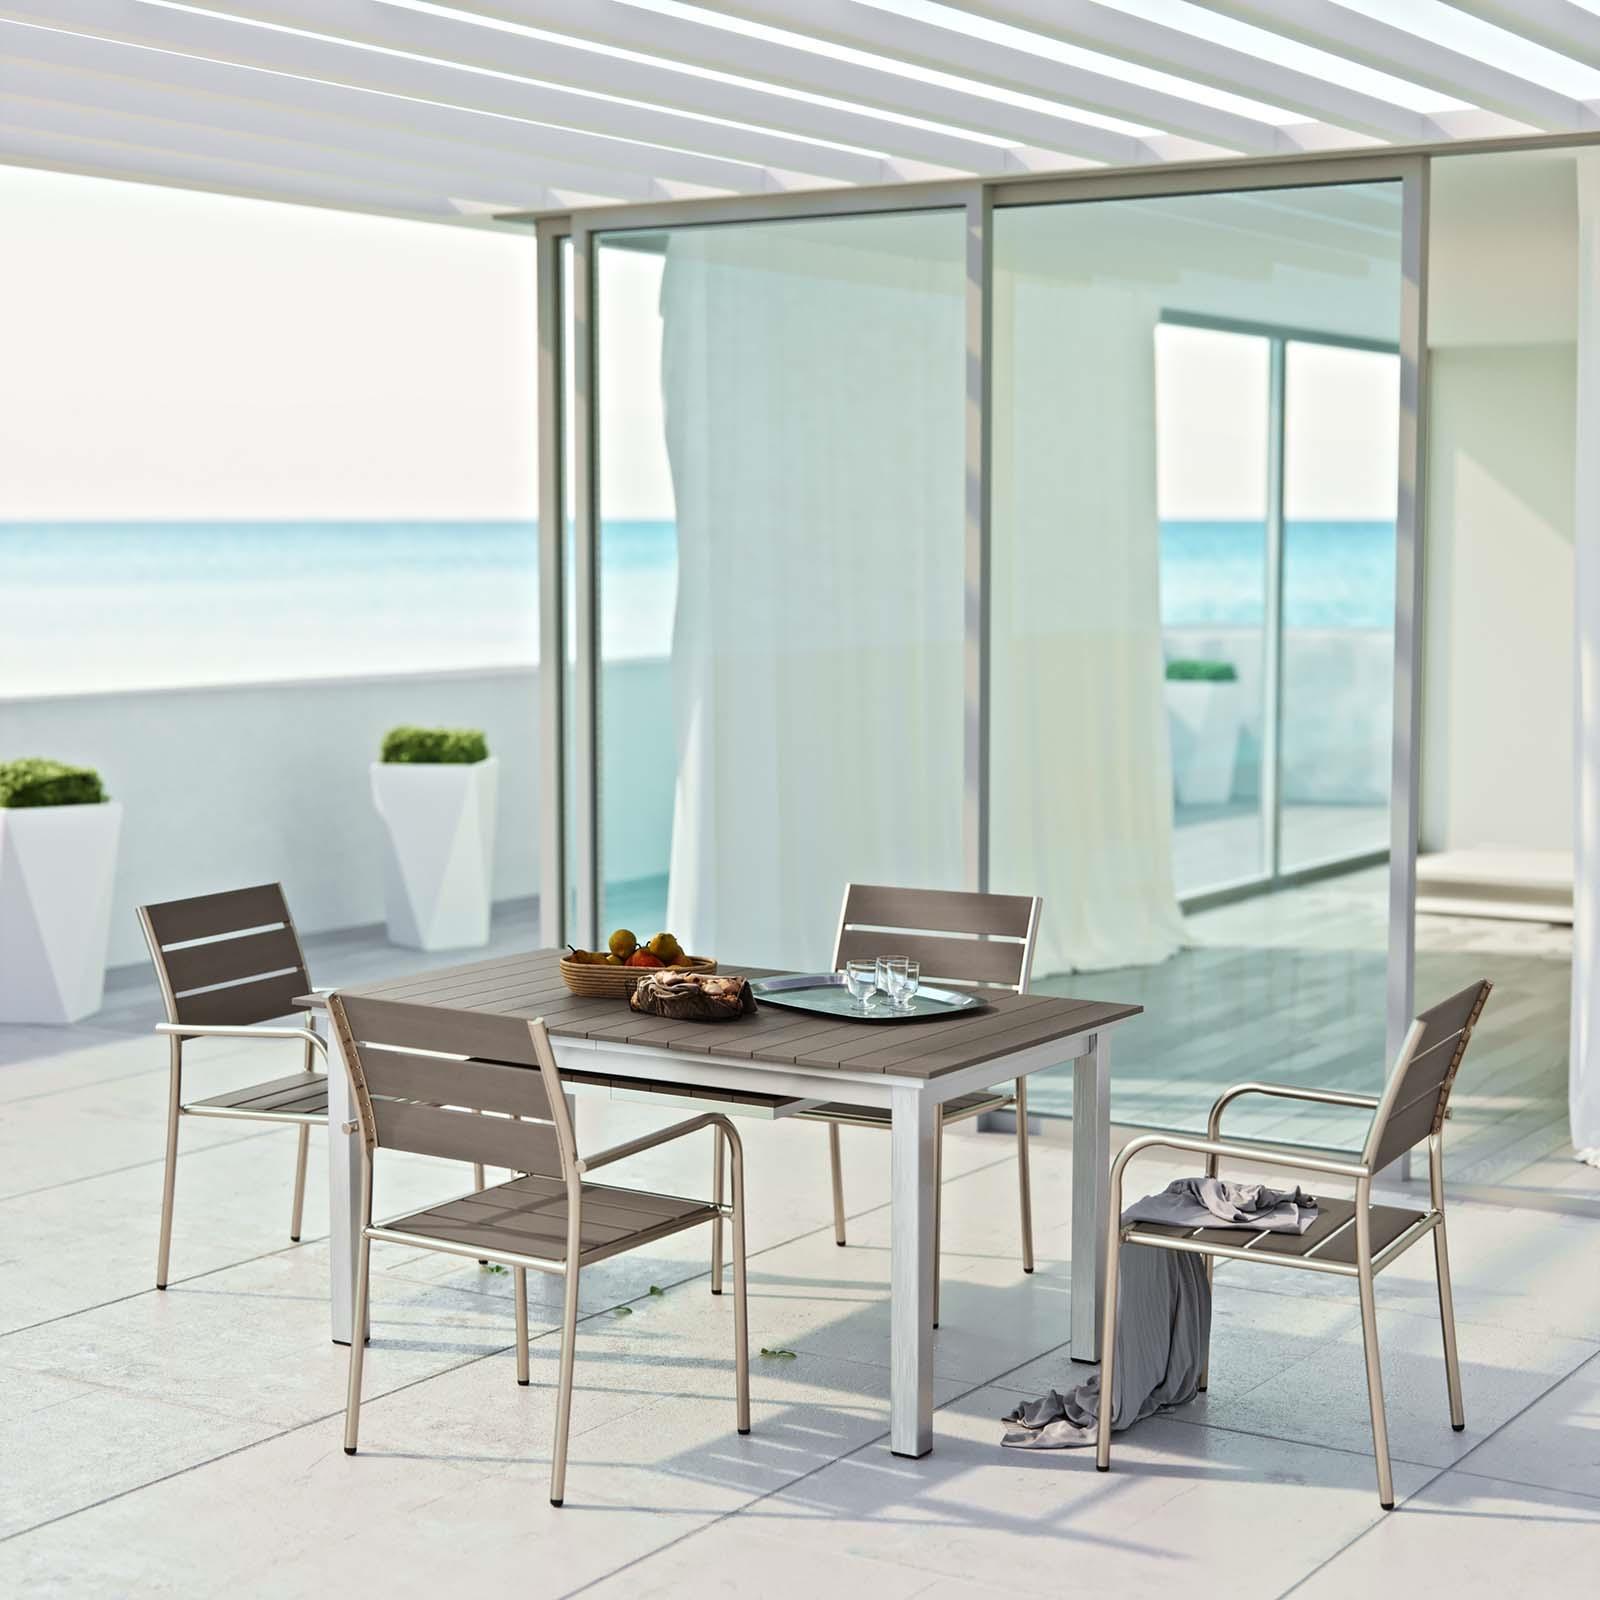 Shore 5 Piece Outdoor Patio Aluminum Outdoor Dining Set in Silver Gray